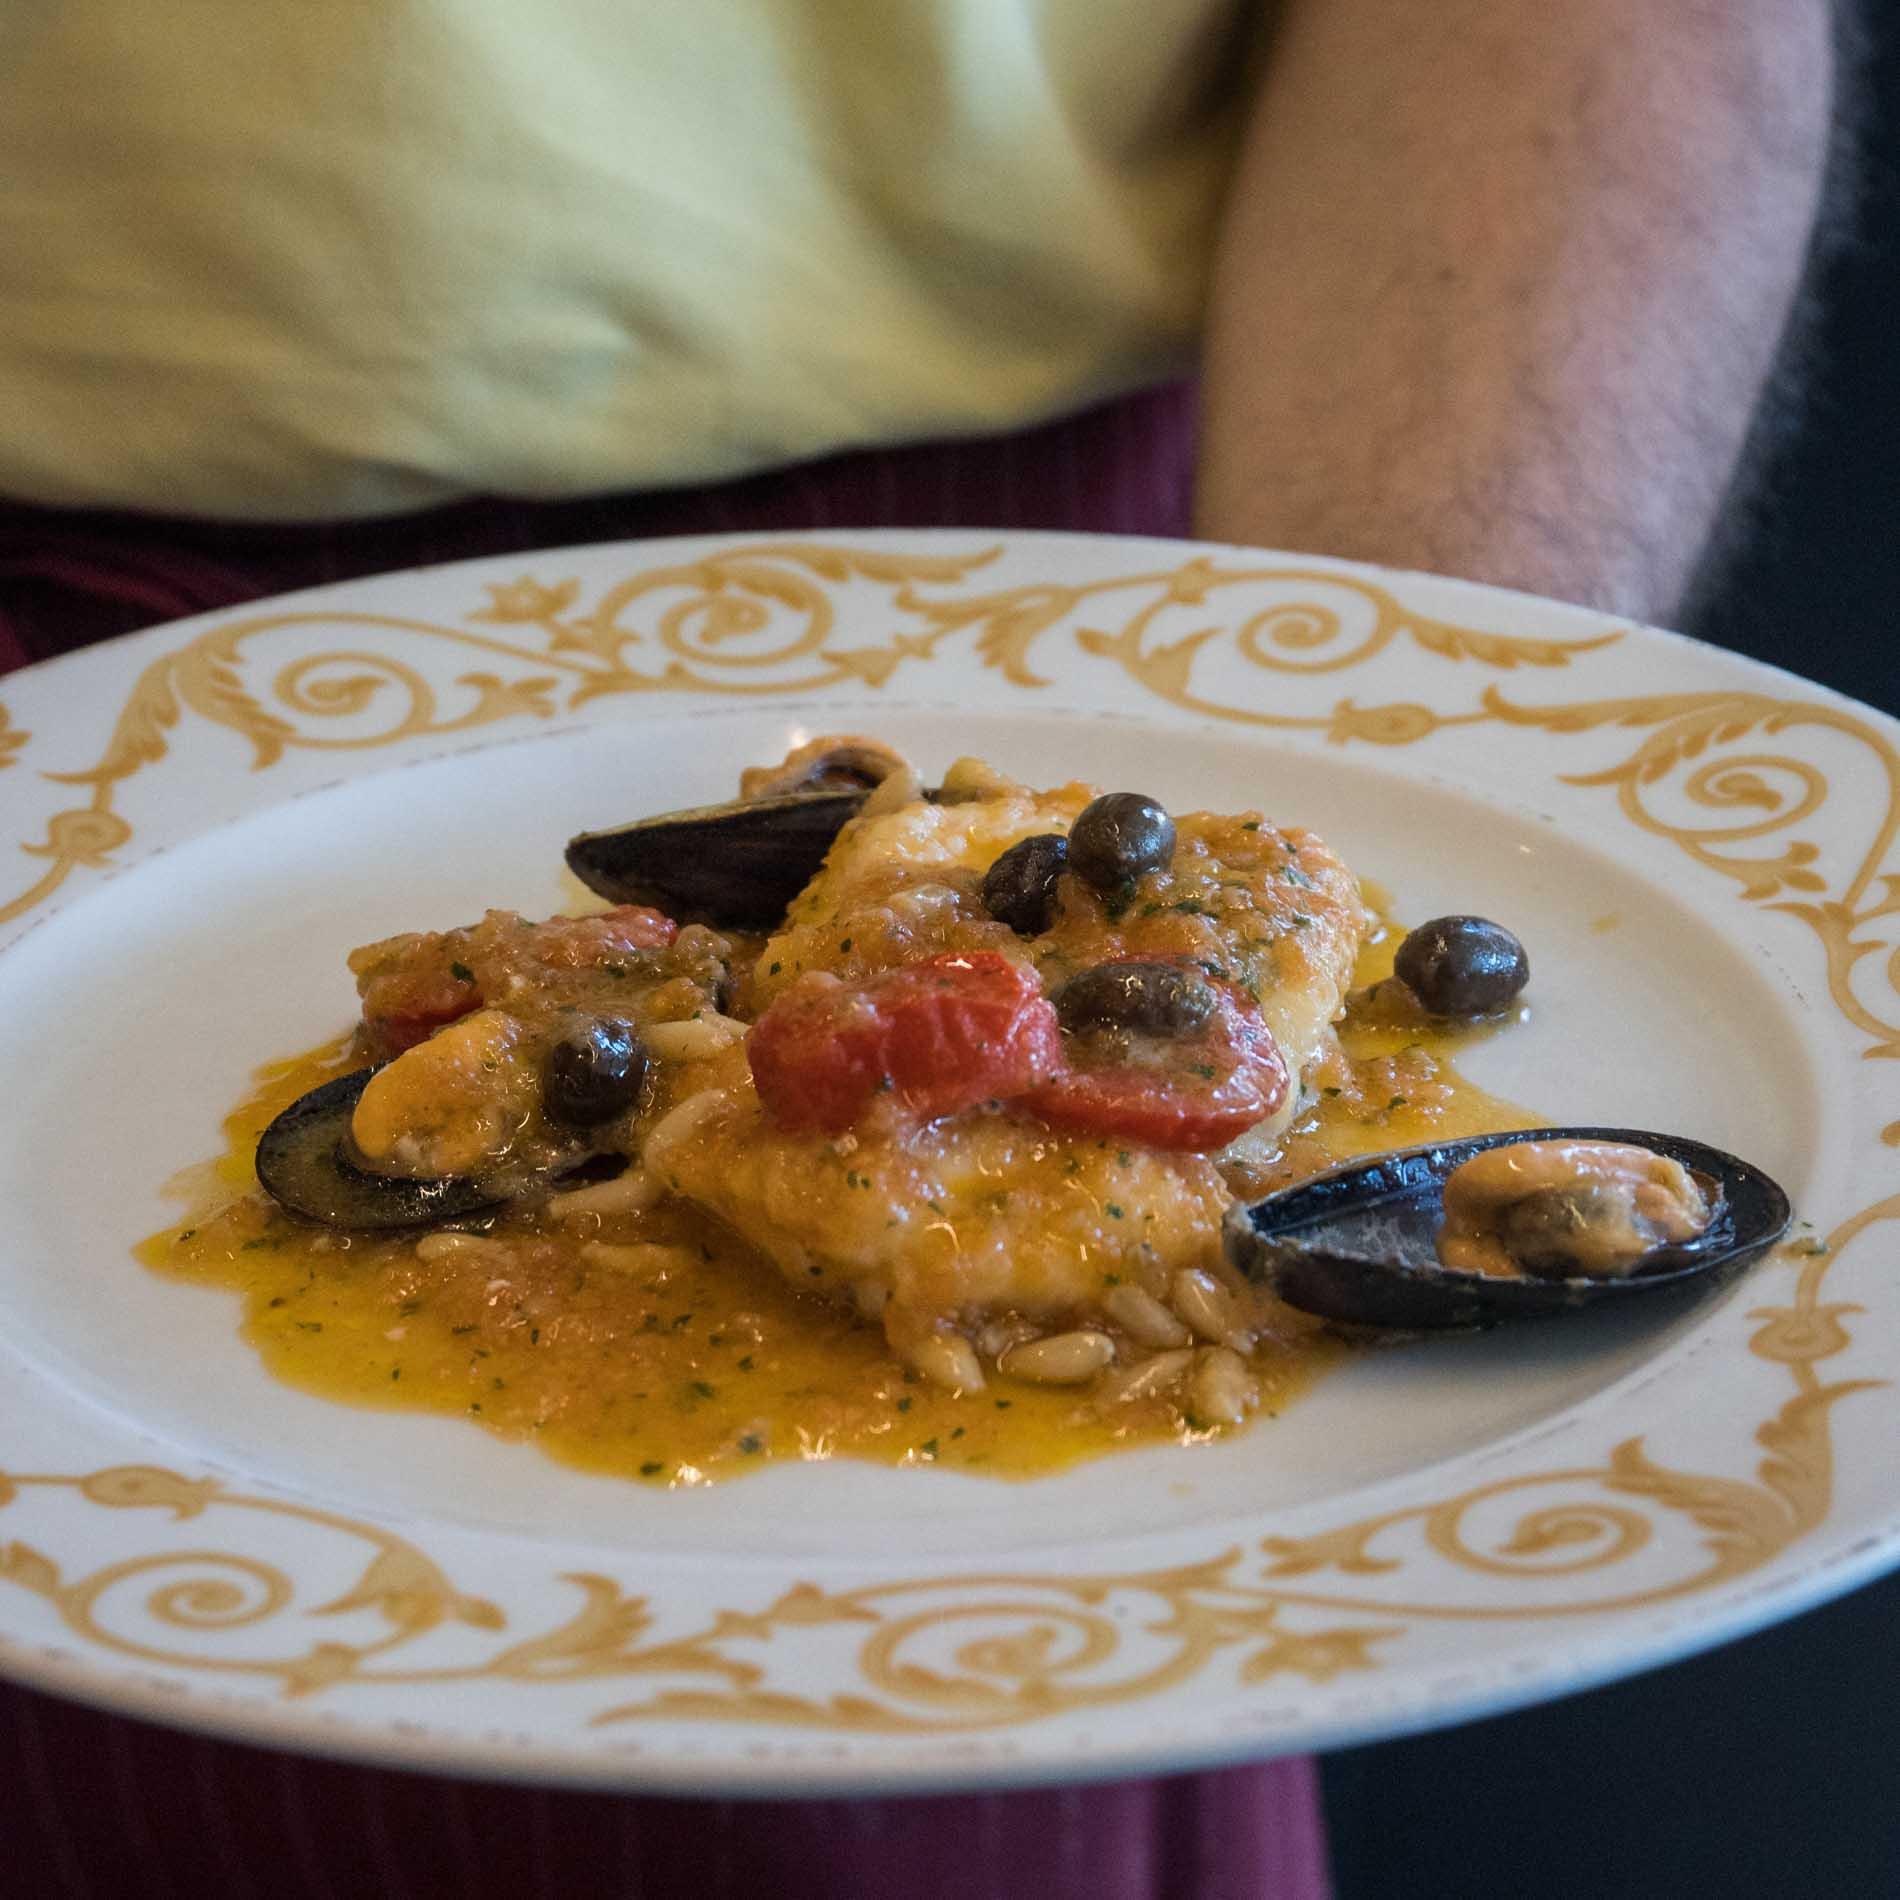 la-piedigrotta-ristorante-da-carmine-e-antonio-216